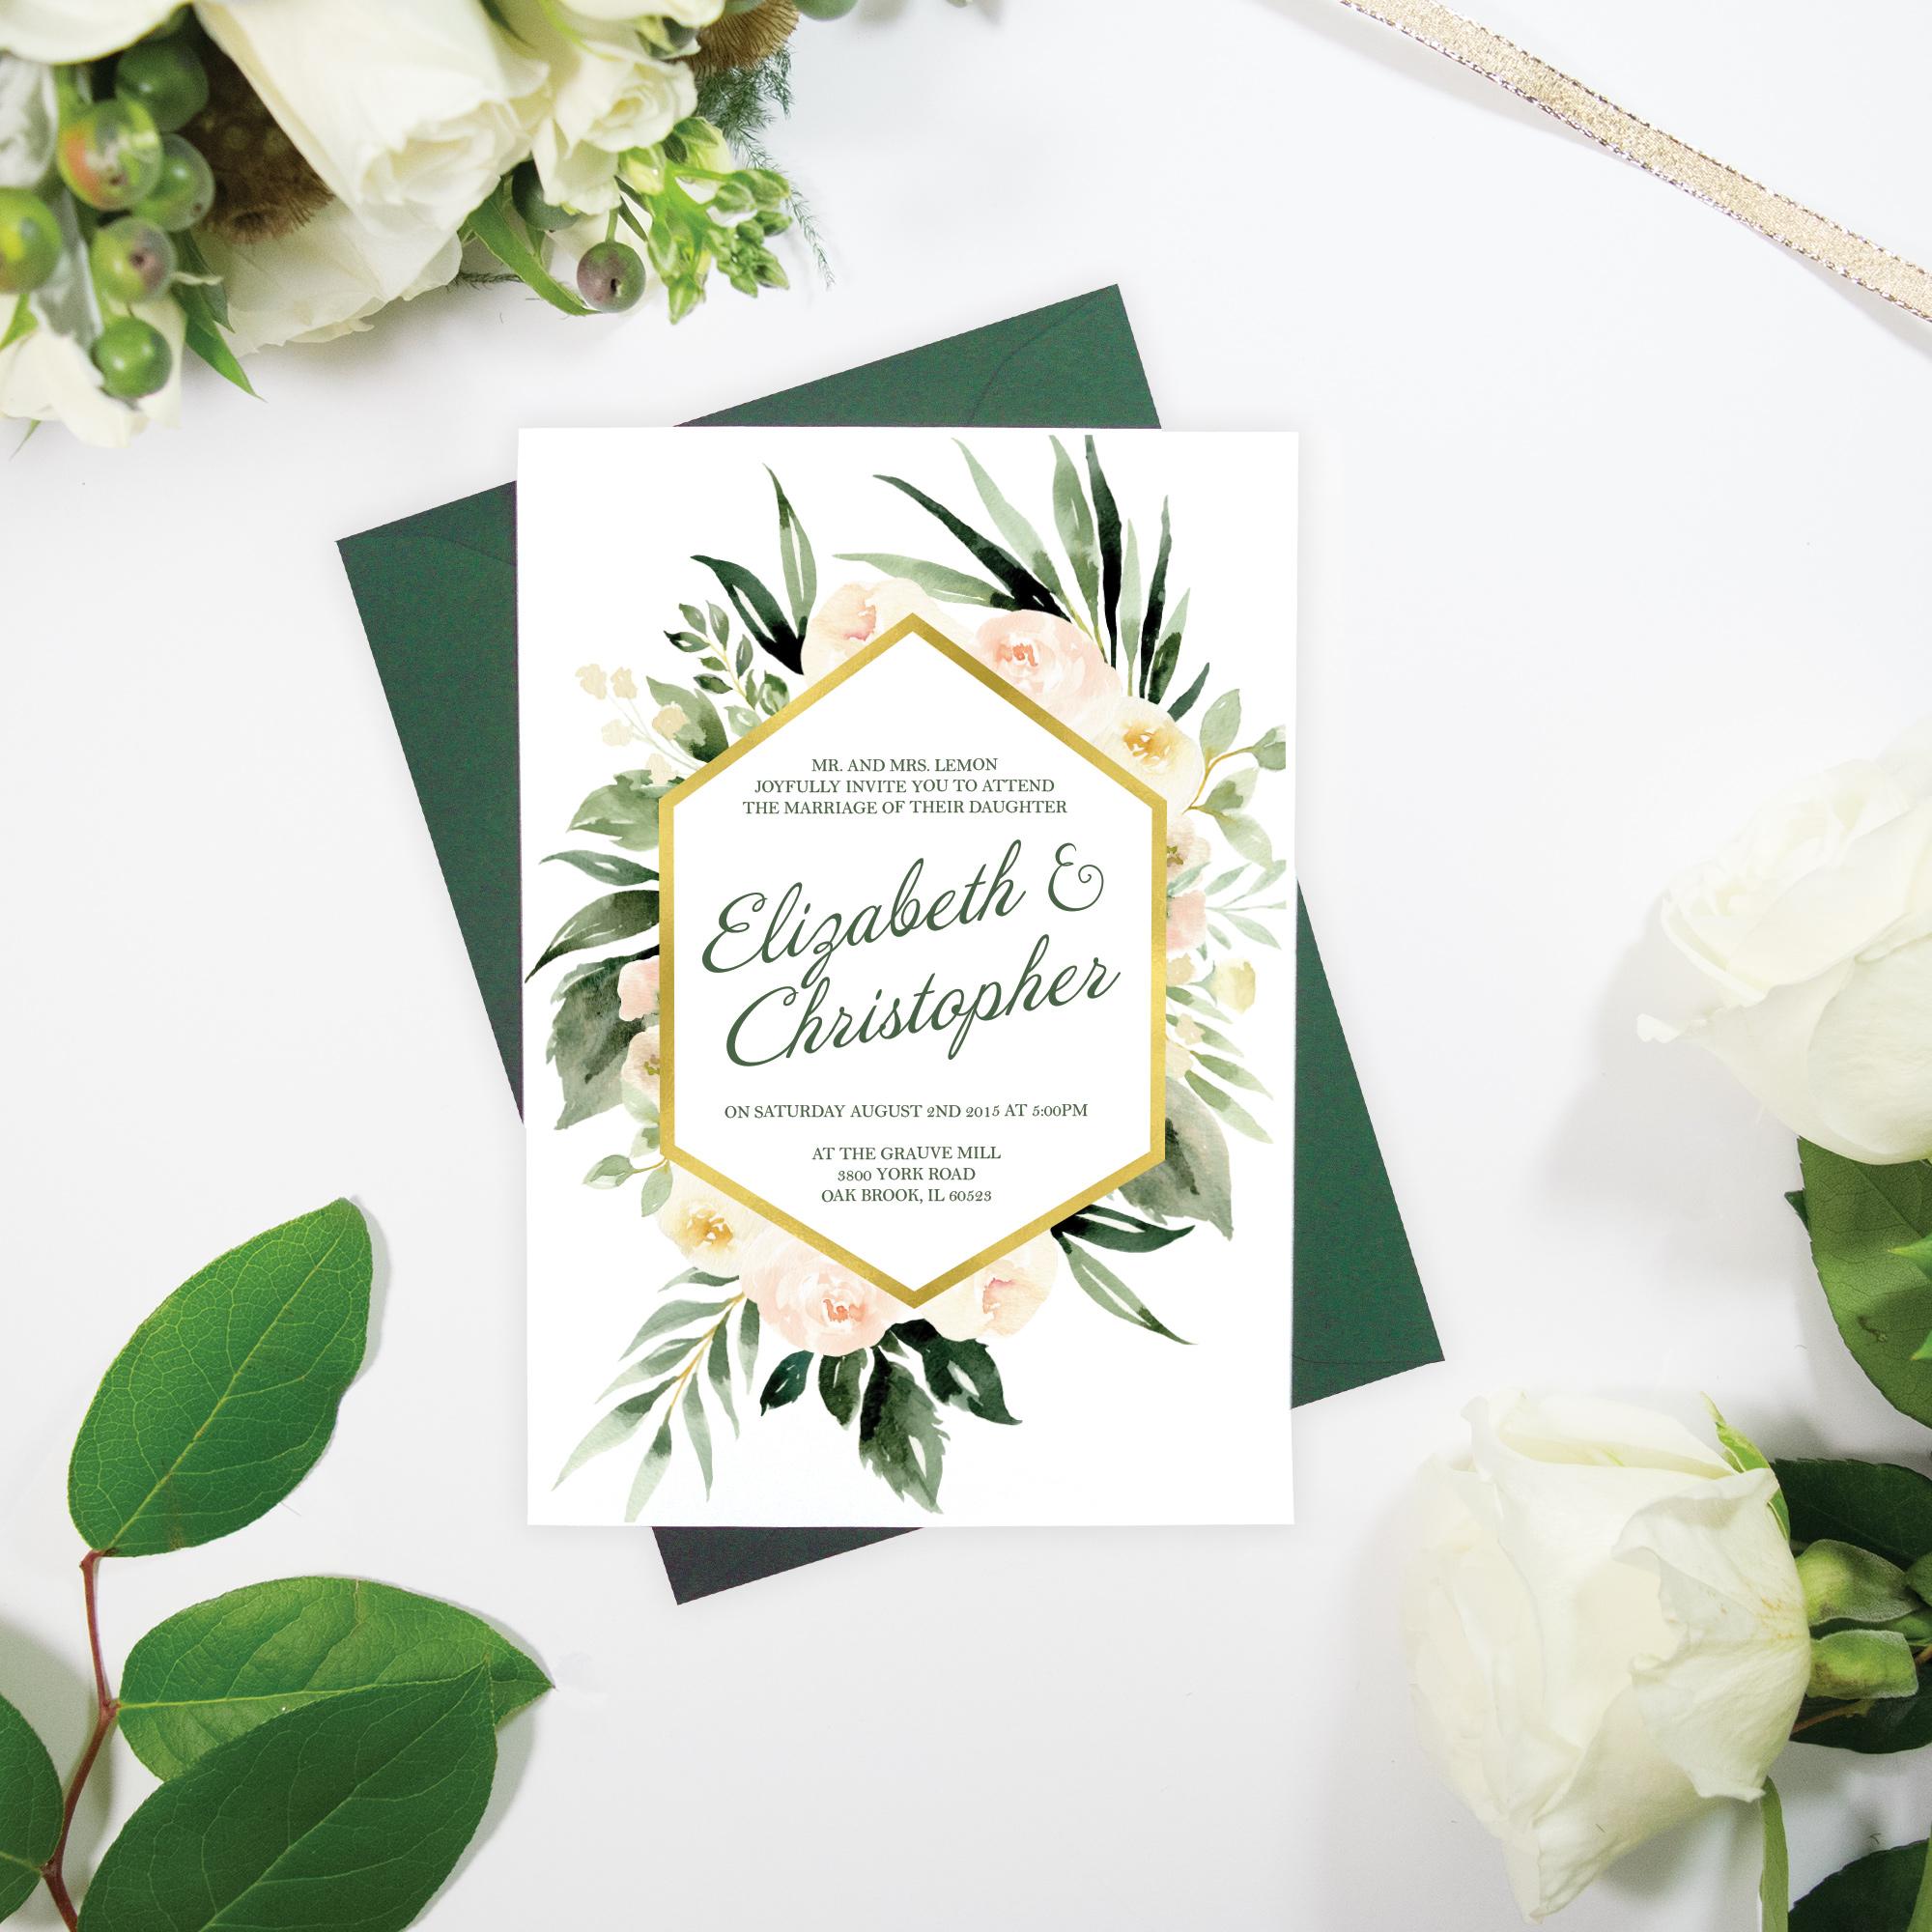 Blush Greenery and Gold Wedding Invitation – White Fox Paper Co